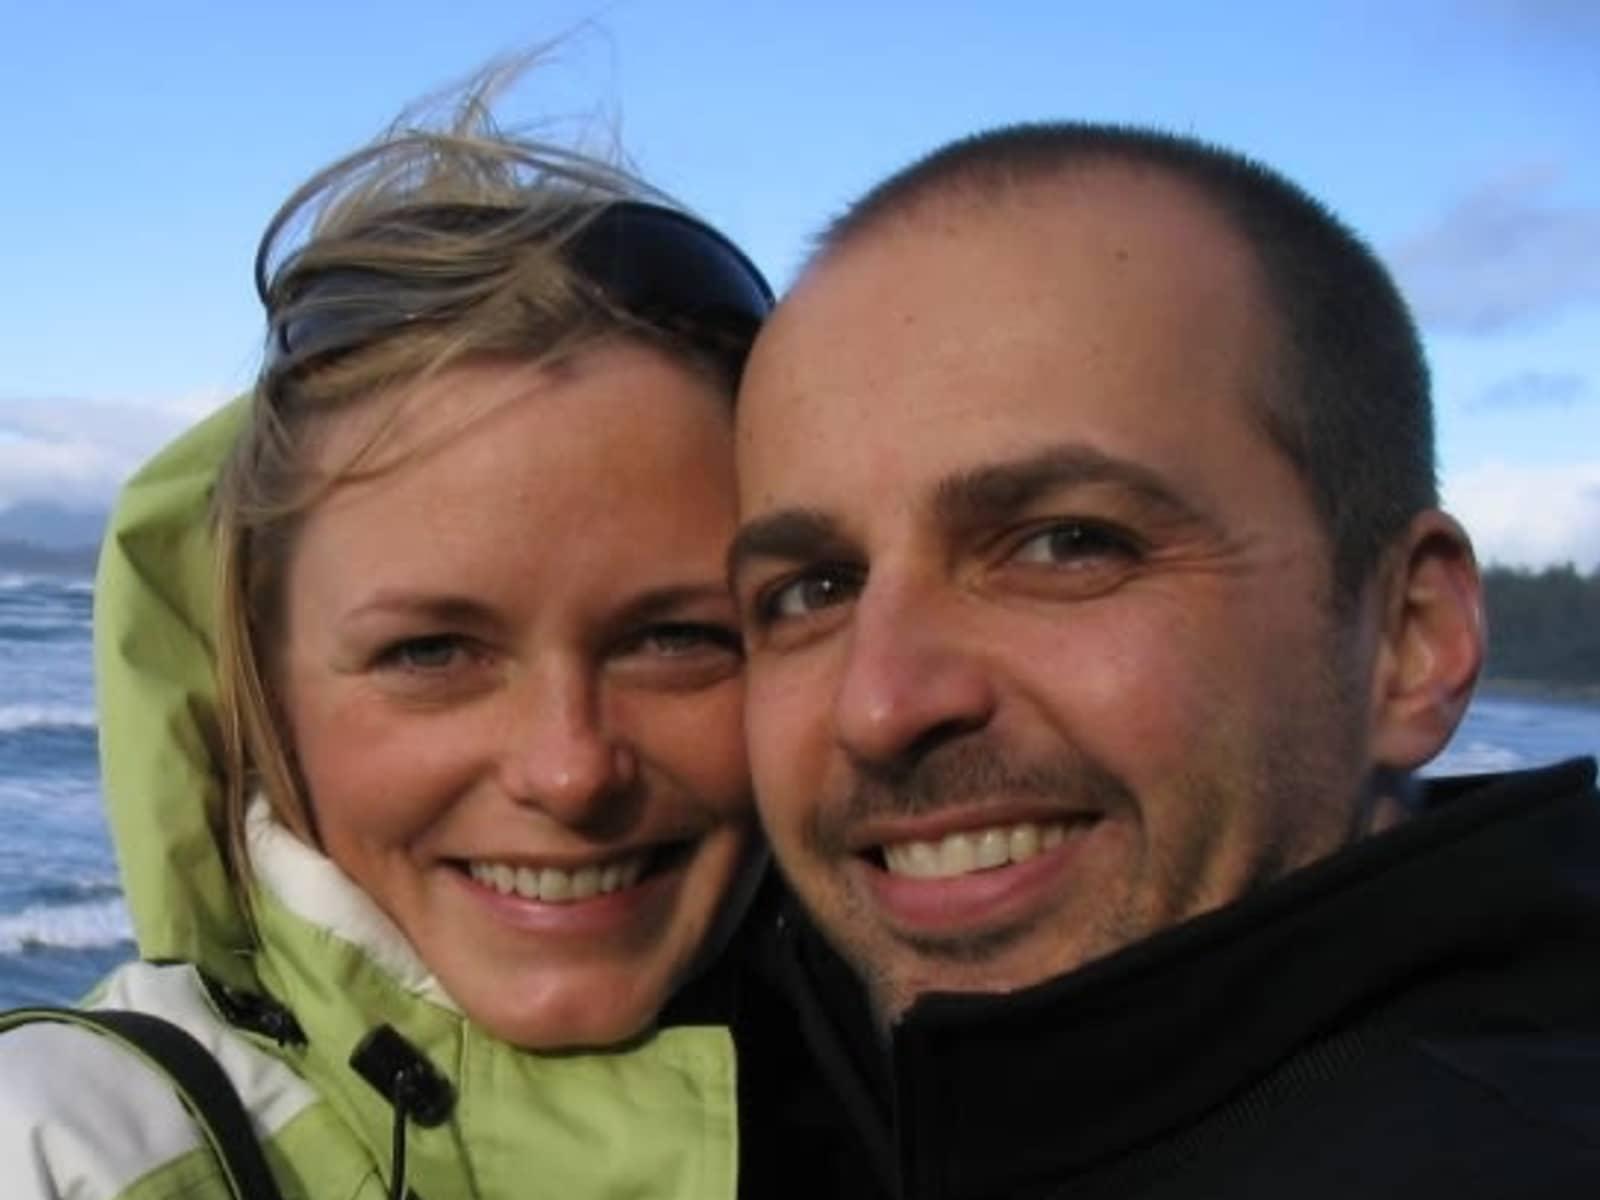 Tim & valerie & Valerie from Kelowna, British Columbia, Canada